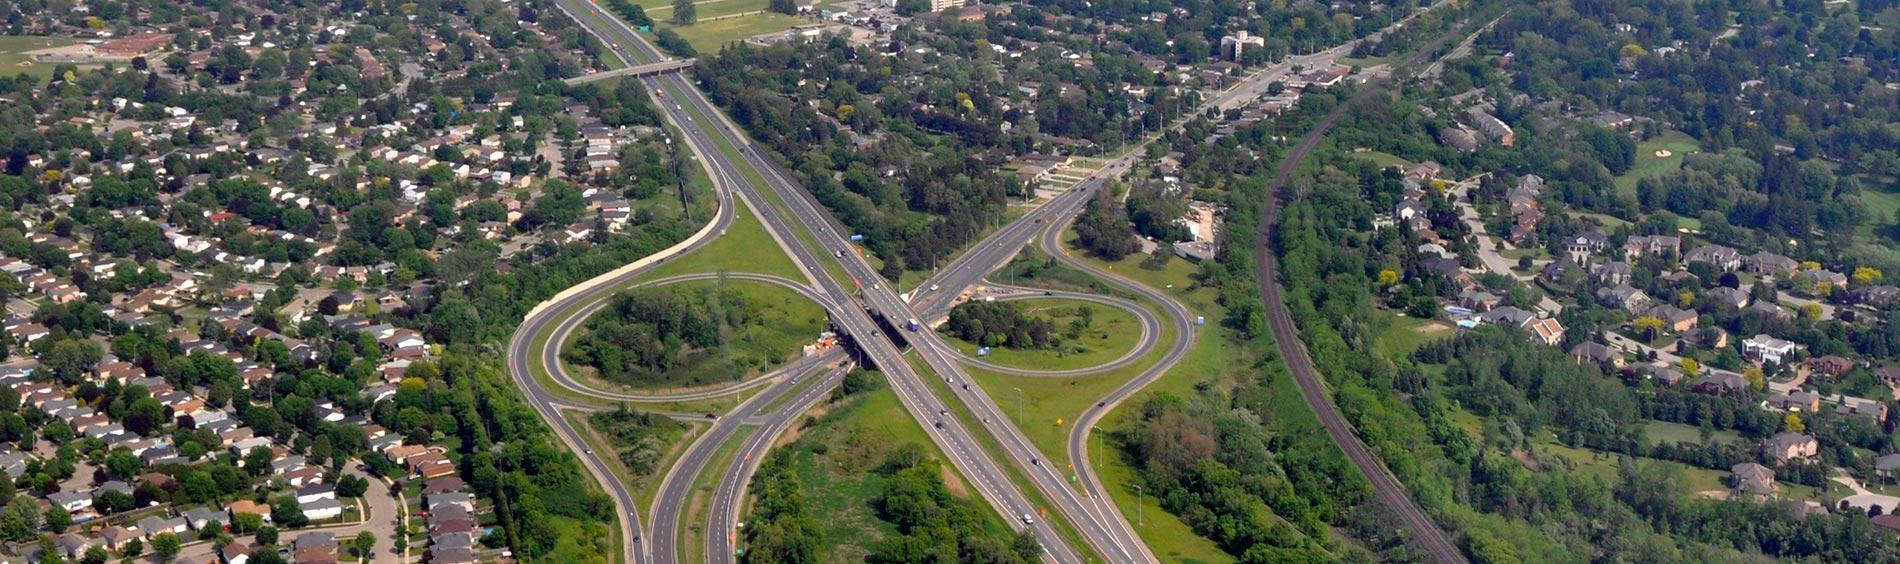 An aerial photograph of Bradford Ontario.